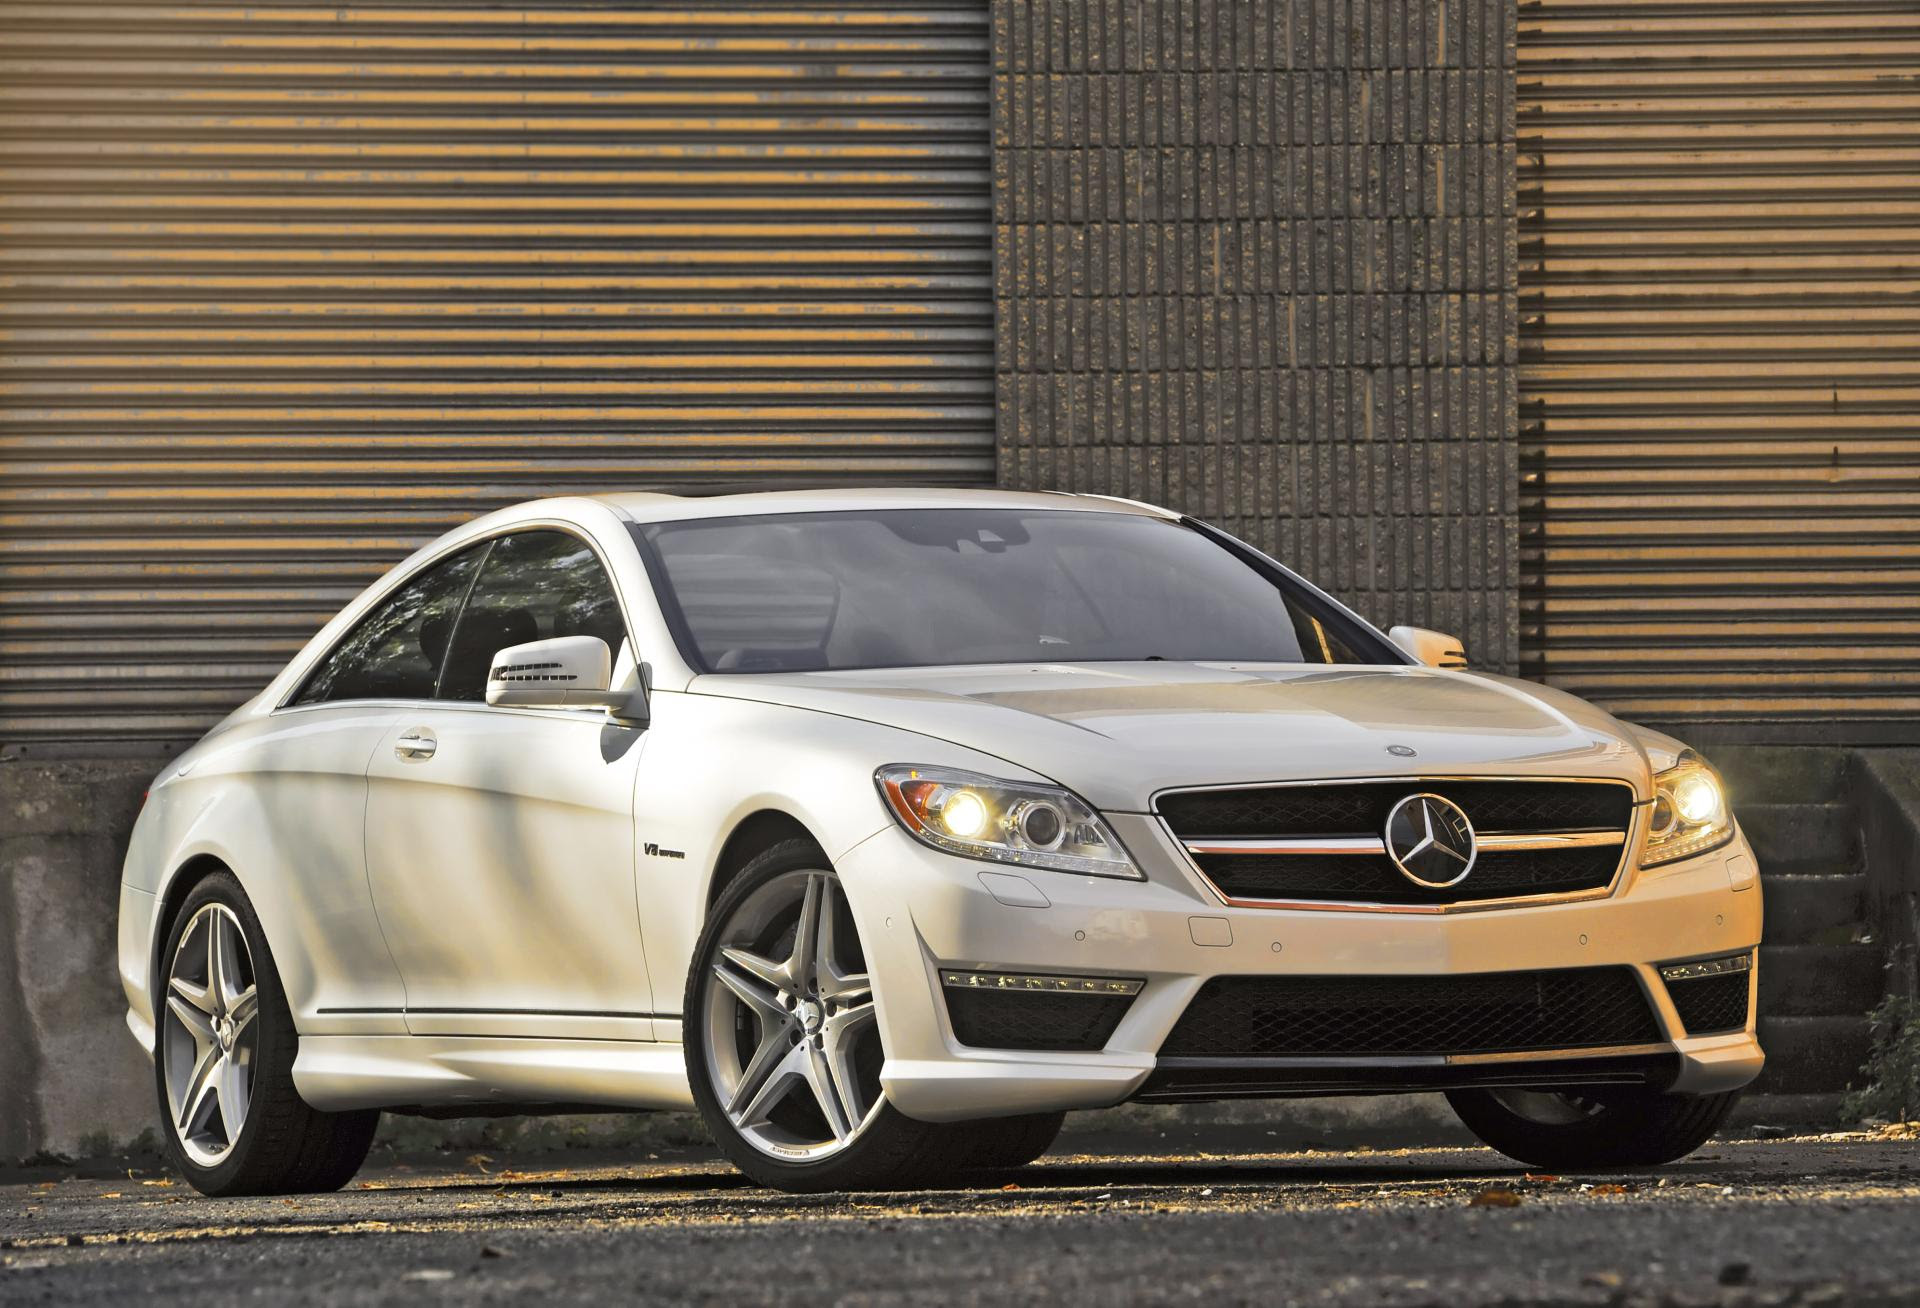 2012 Mercedes-Benz CL-Class - conceptcarz.com